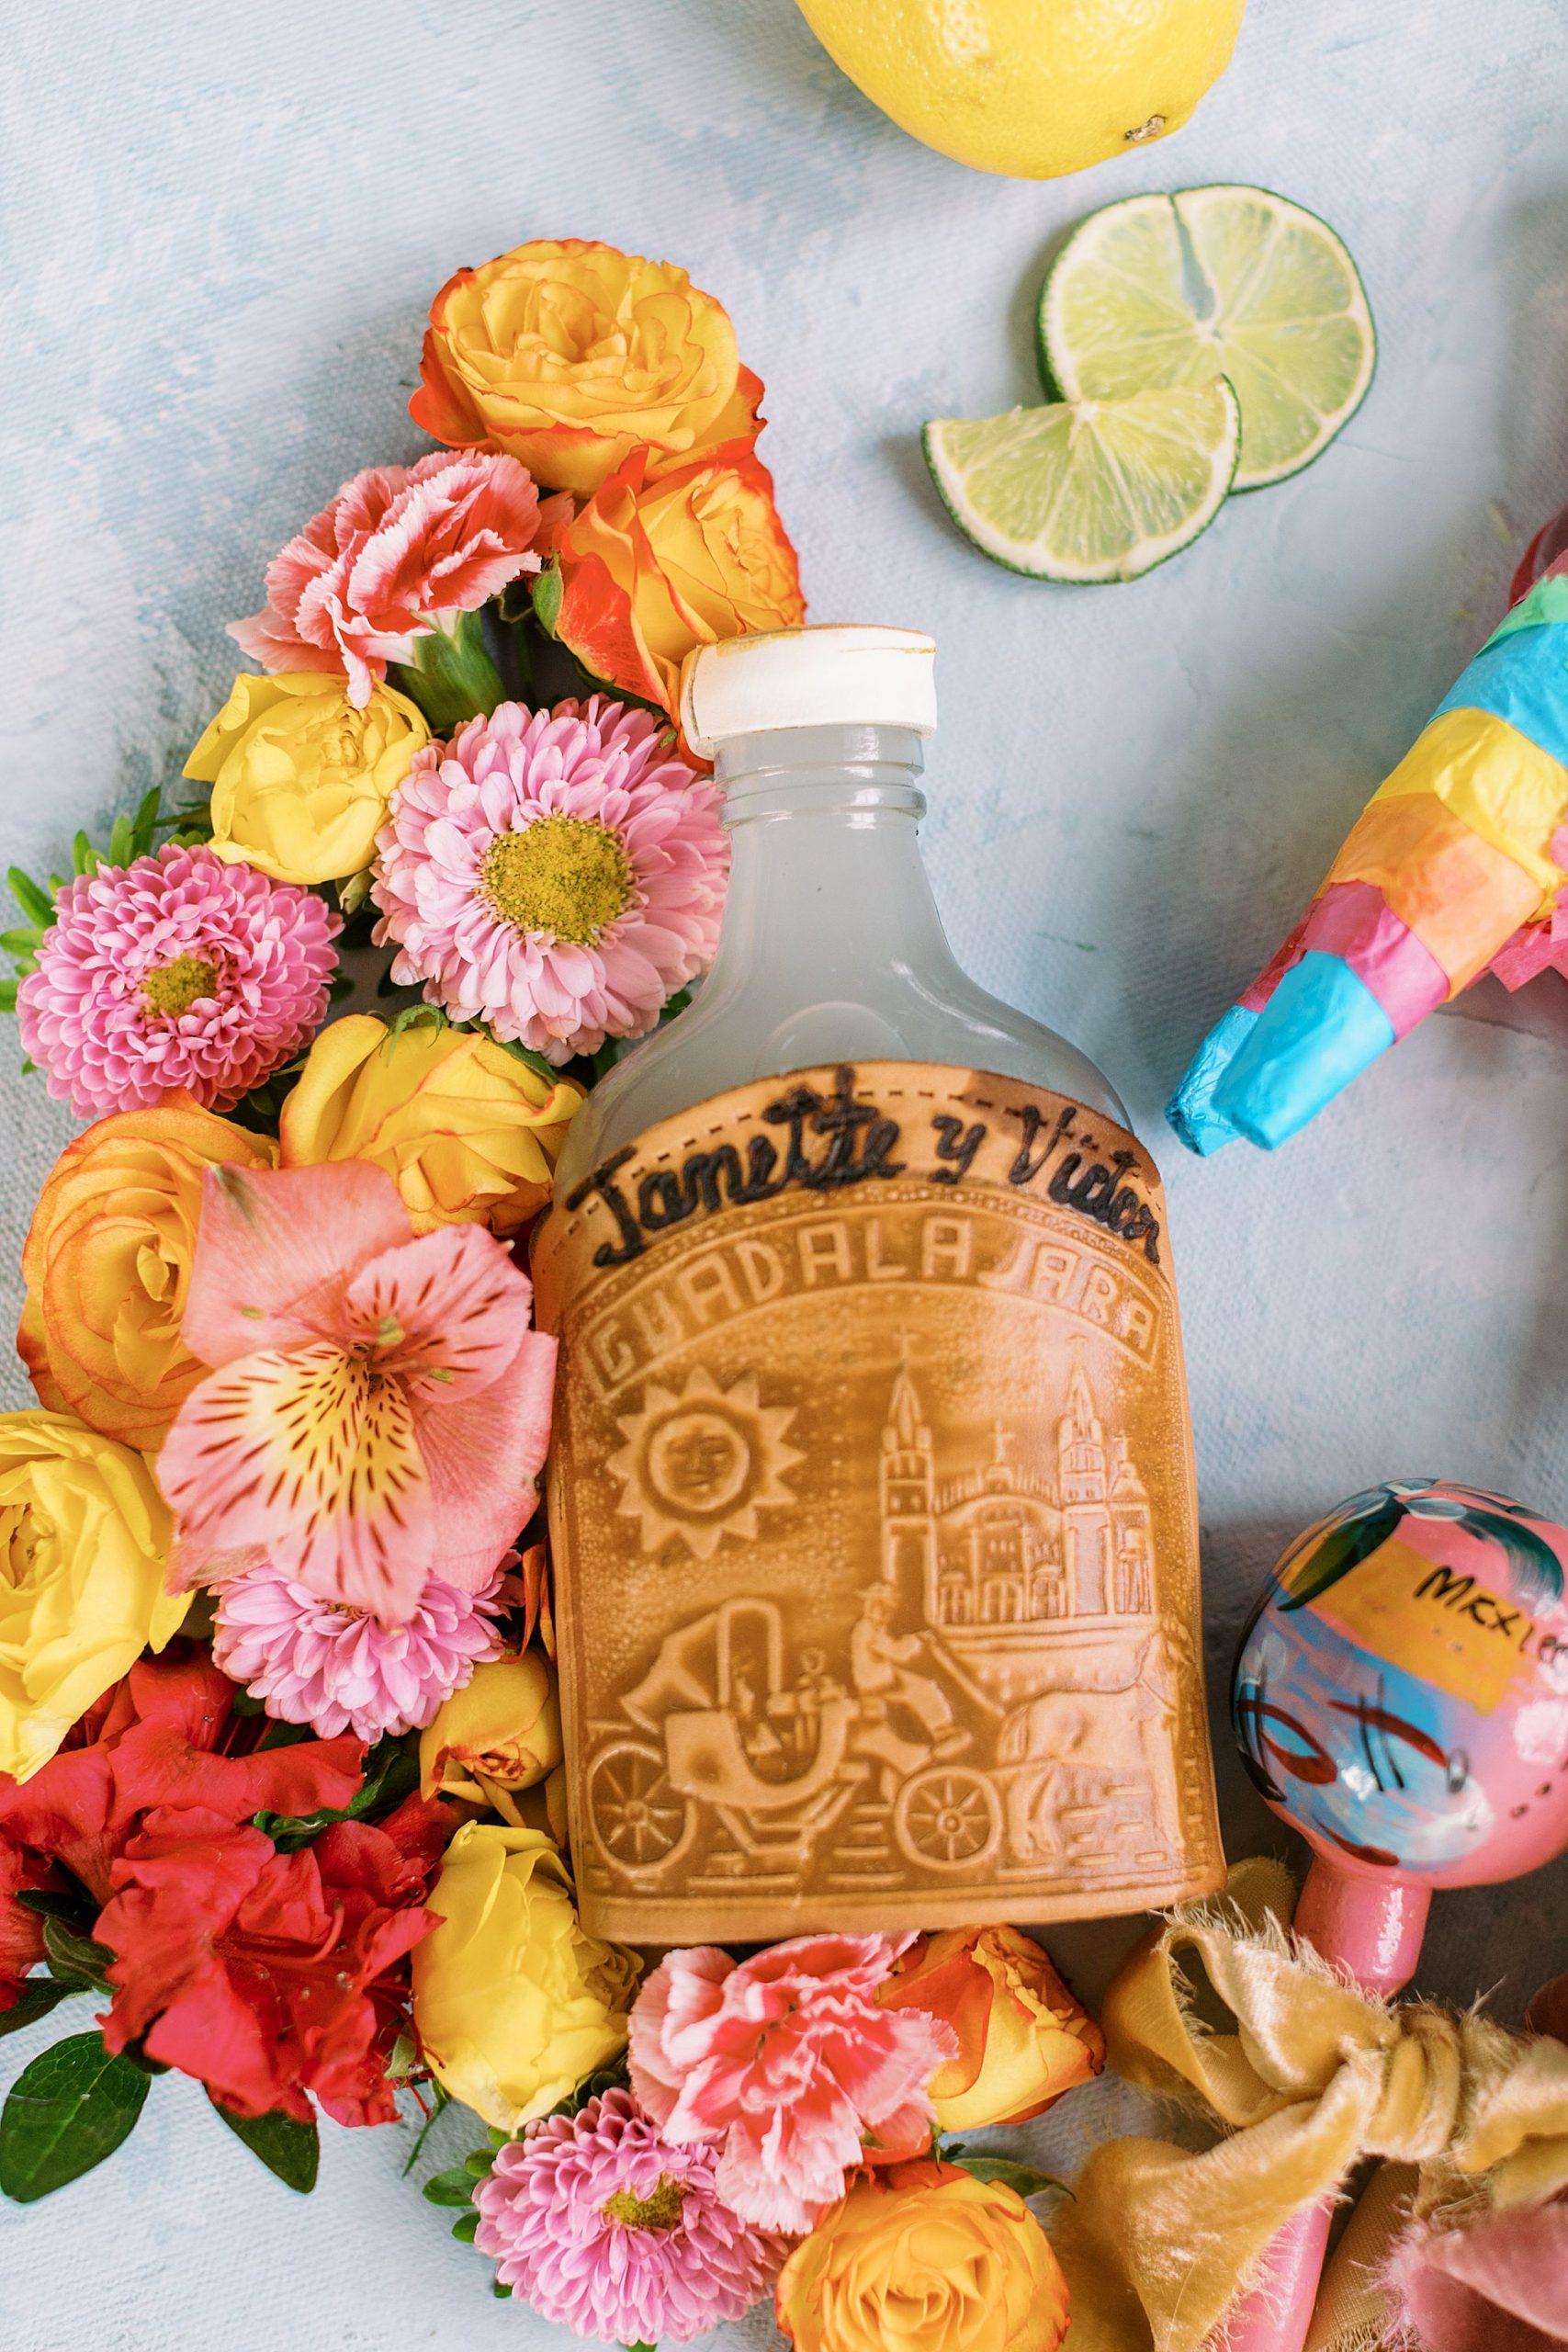 Cinco De Mayo Inspiration for Your FIesta - Party Crush Studio and Ashley Baumgartner_0054.jpg